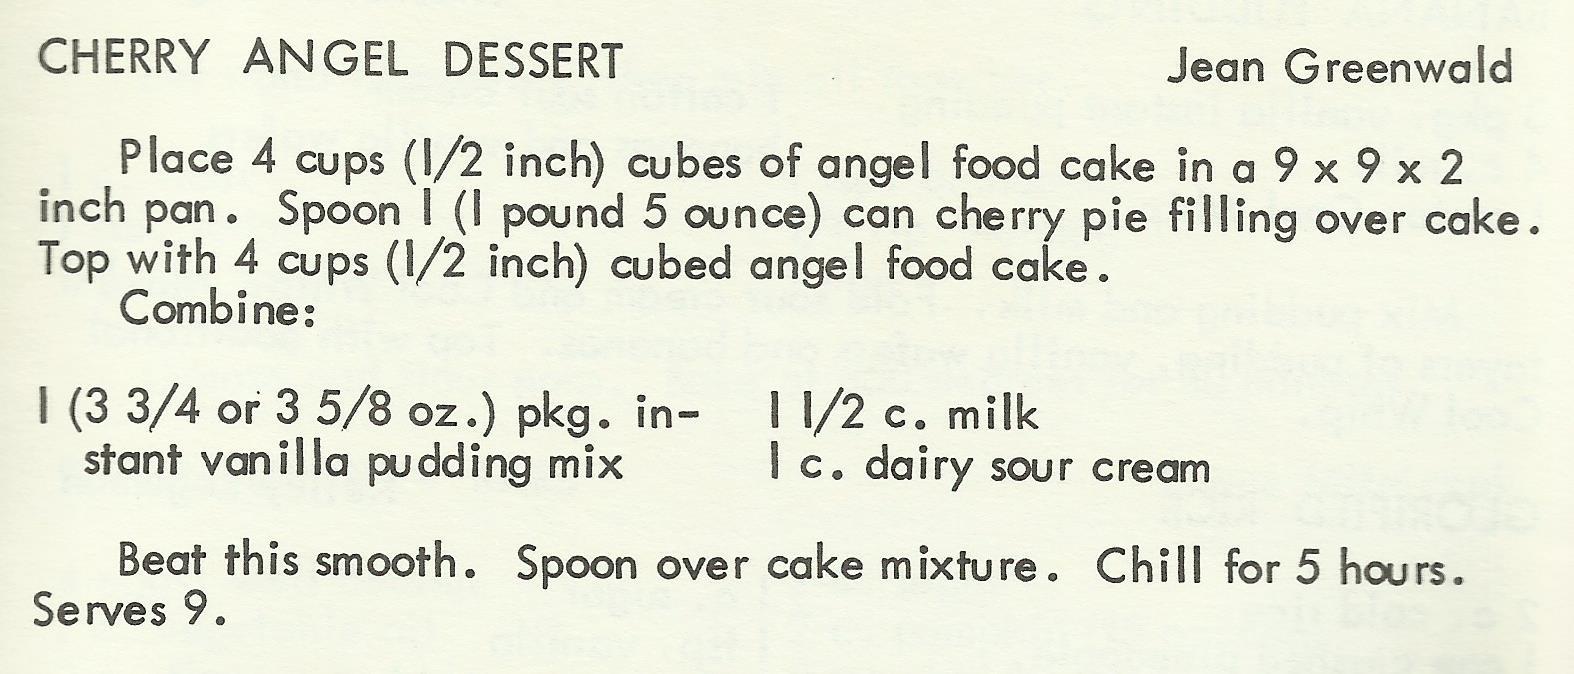 Cherry Angel Dessert